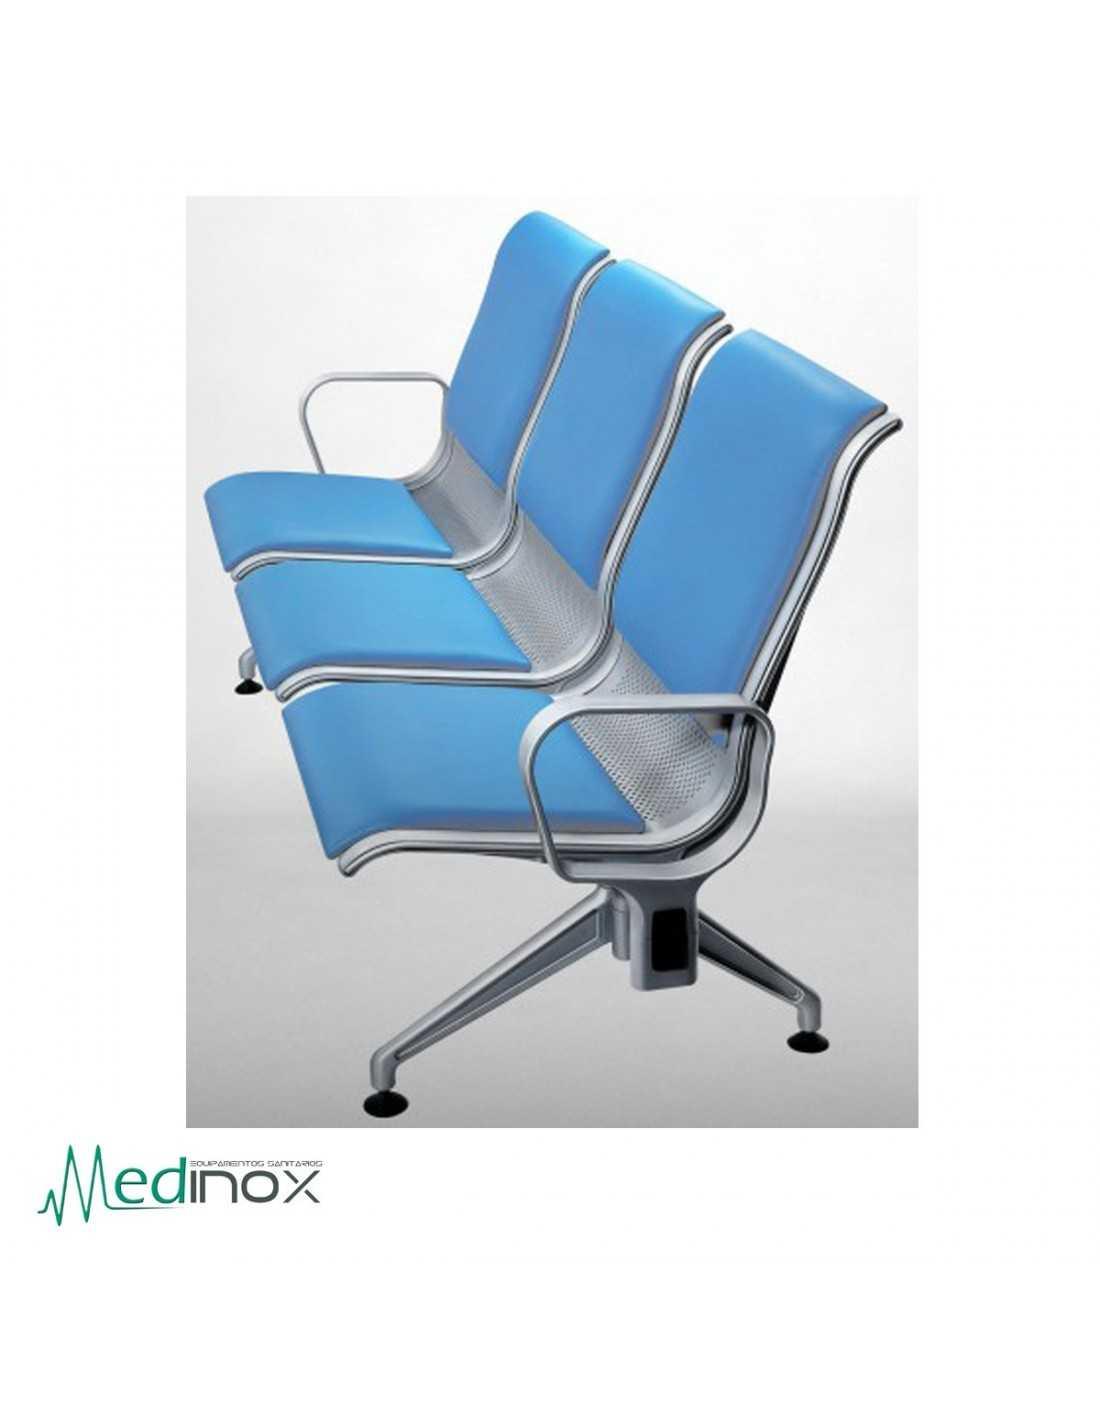 Sillas sala espera rljava3 bancada 3 sillas de espera en for Sillas sala de espera